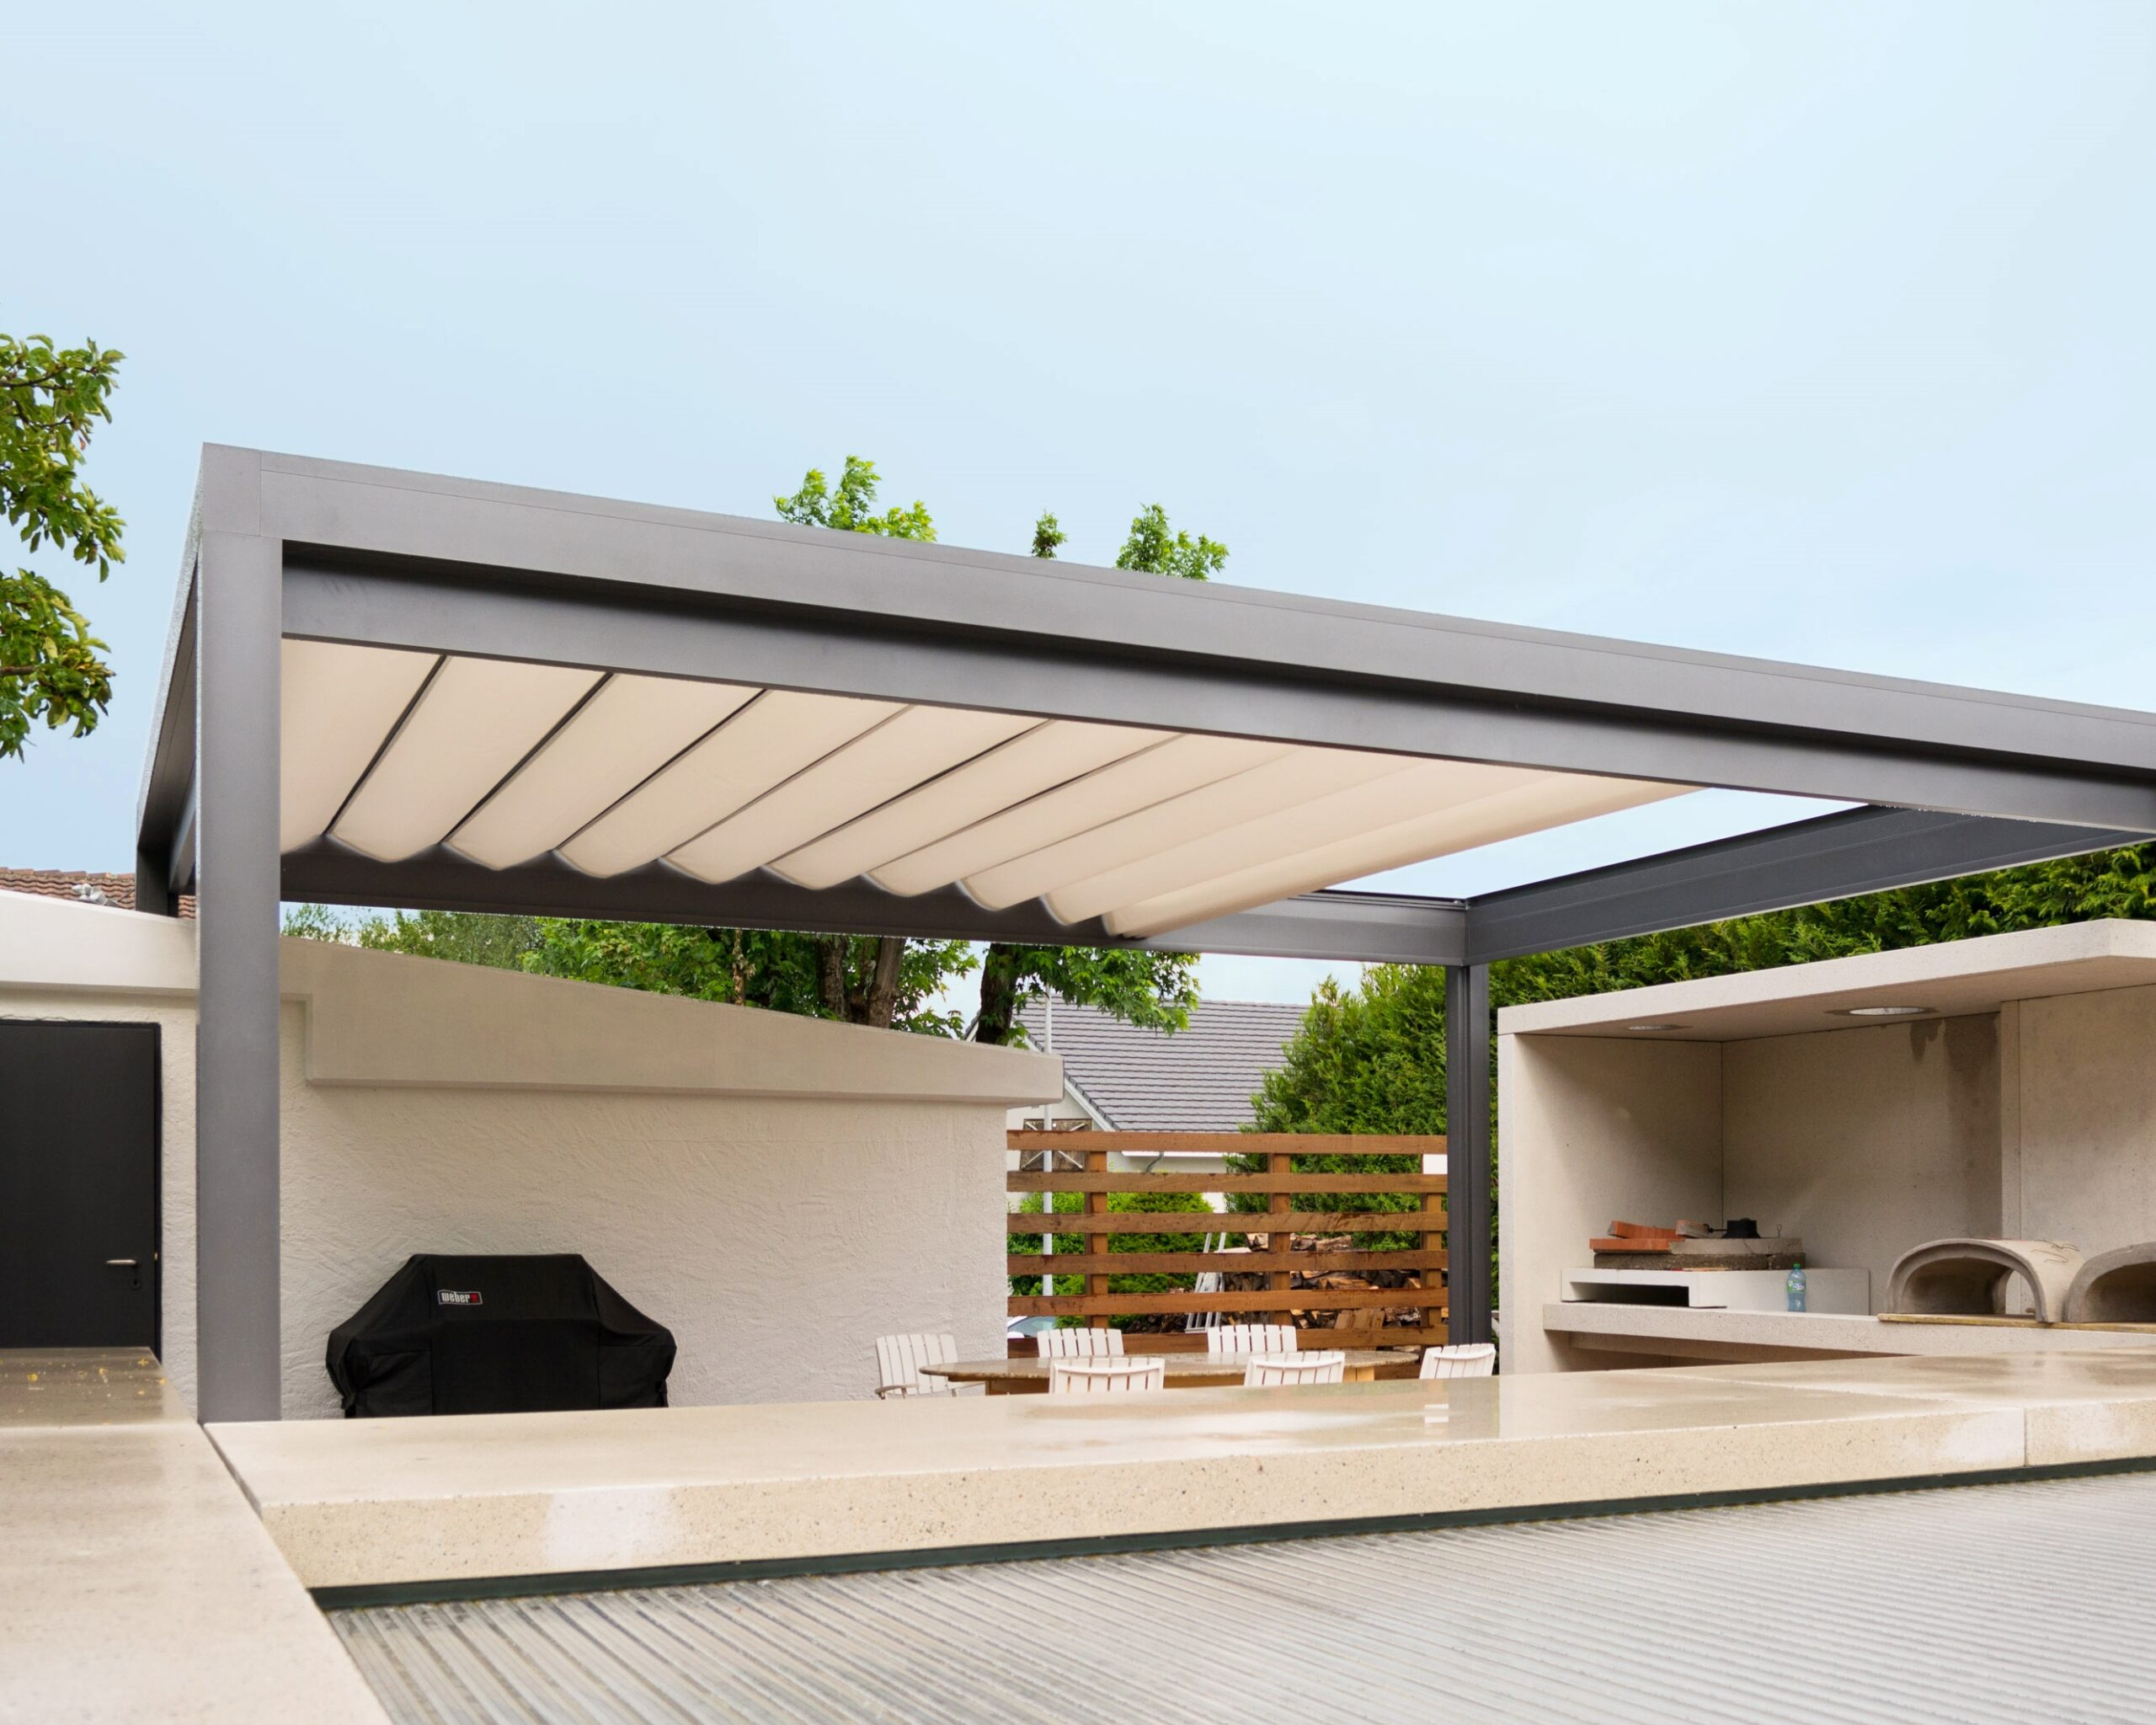 Full Size of Terrassen Pavillon Melano Tp7100 Garten Wohnzimmer Terrassen Pavillon